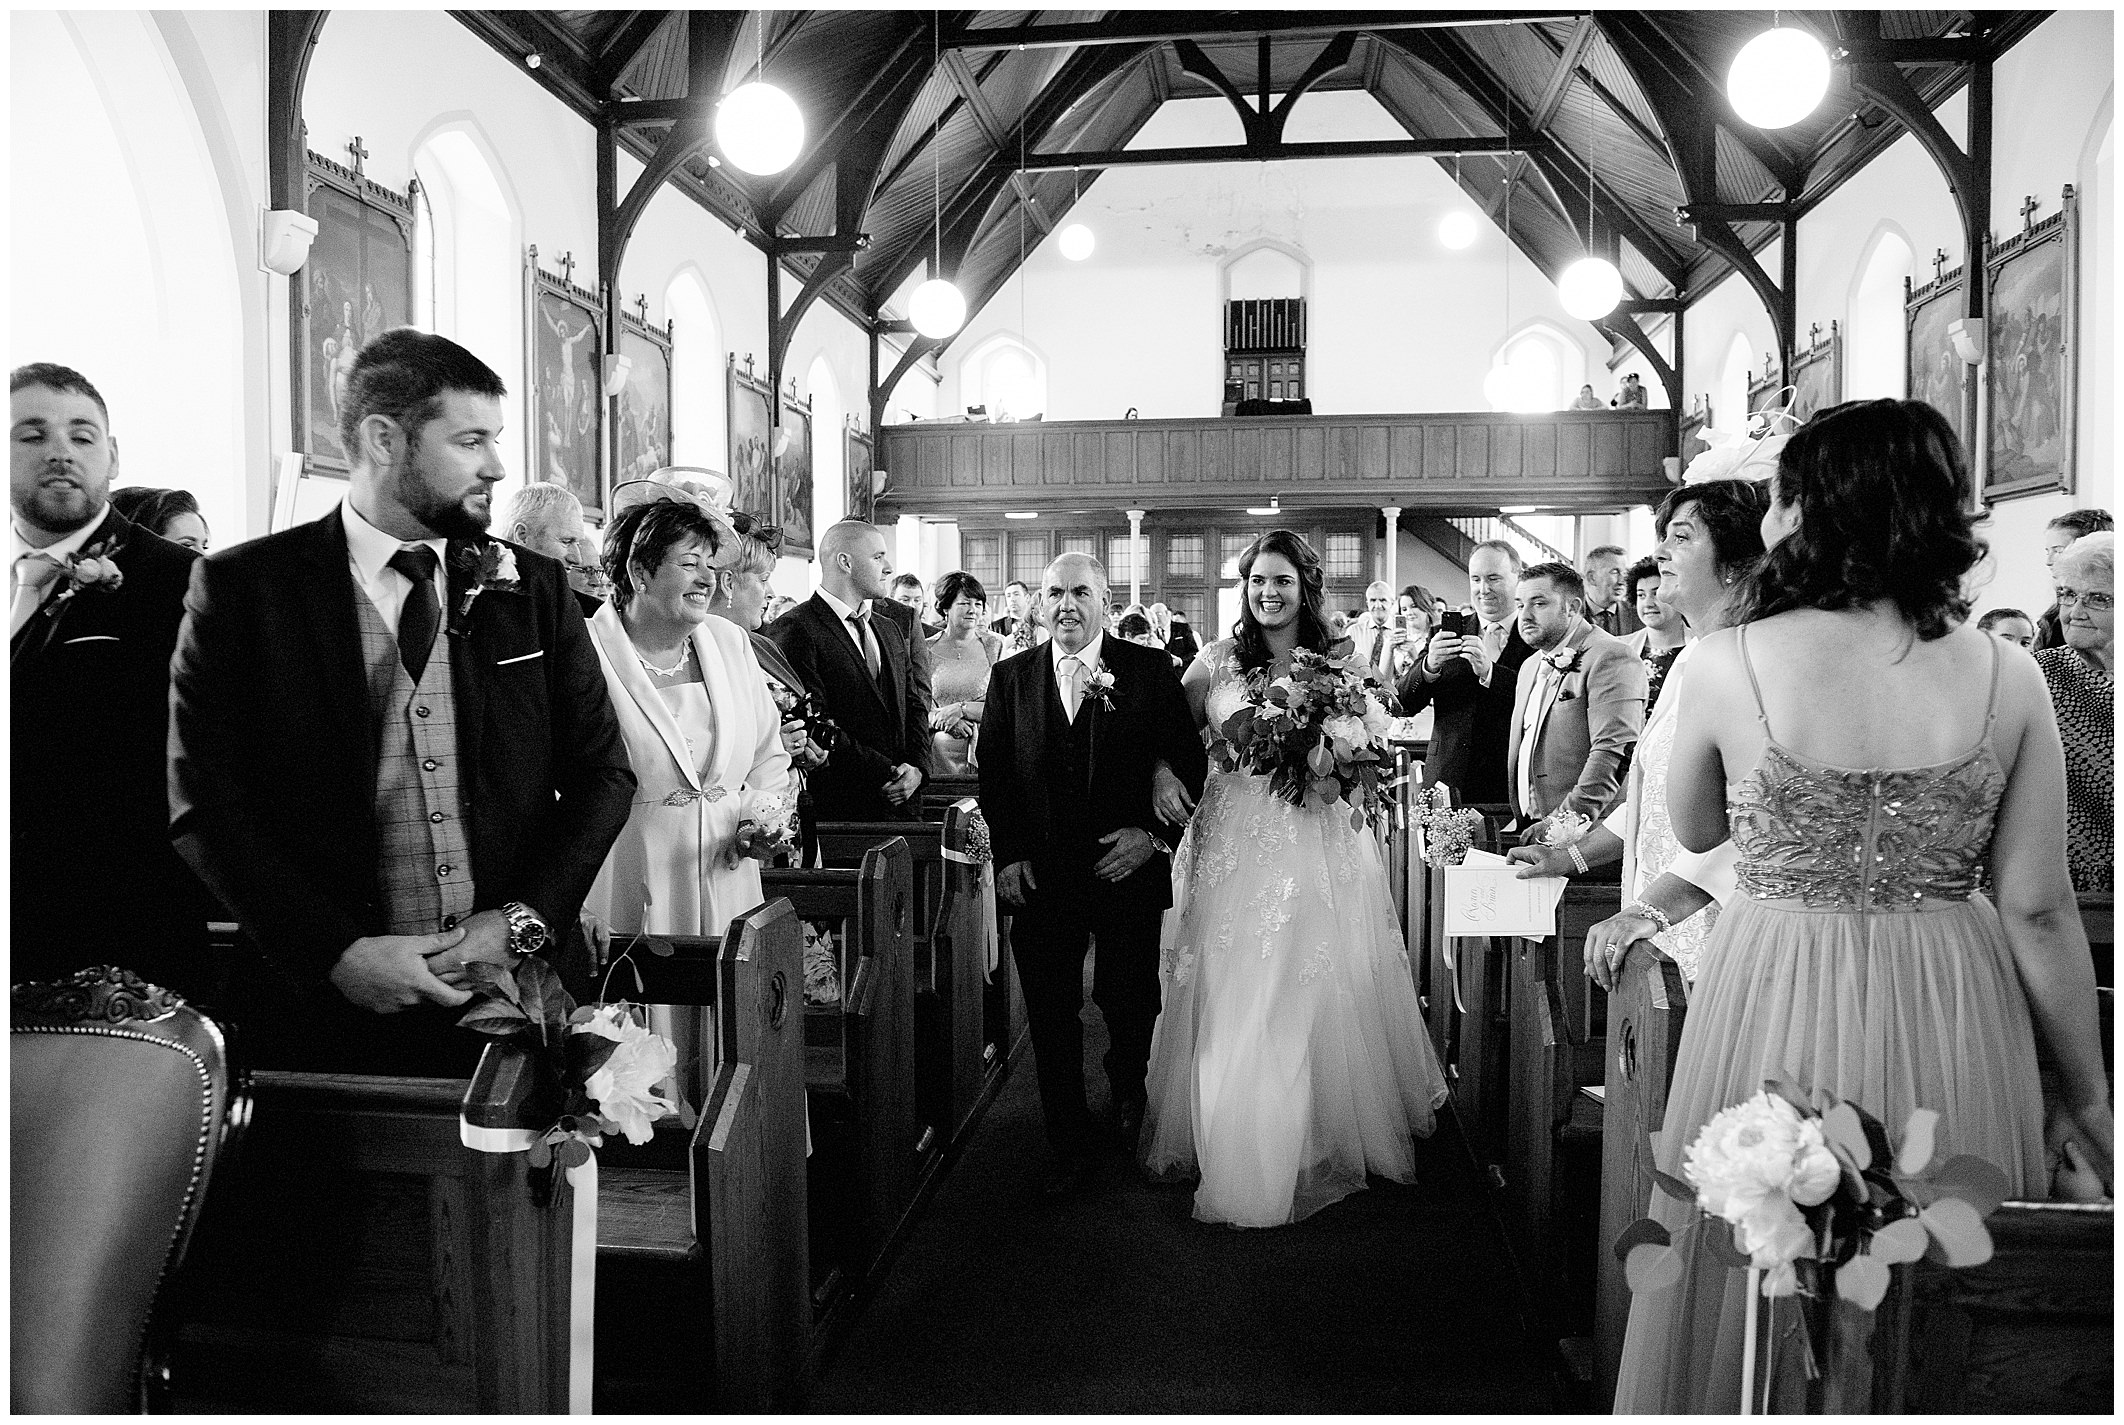 redcastle-hotel-wedding-karen-brian-jude-browne-photography-064.jpg